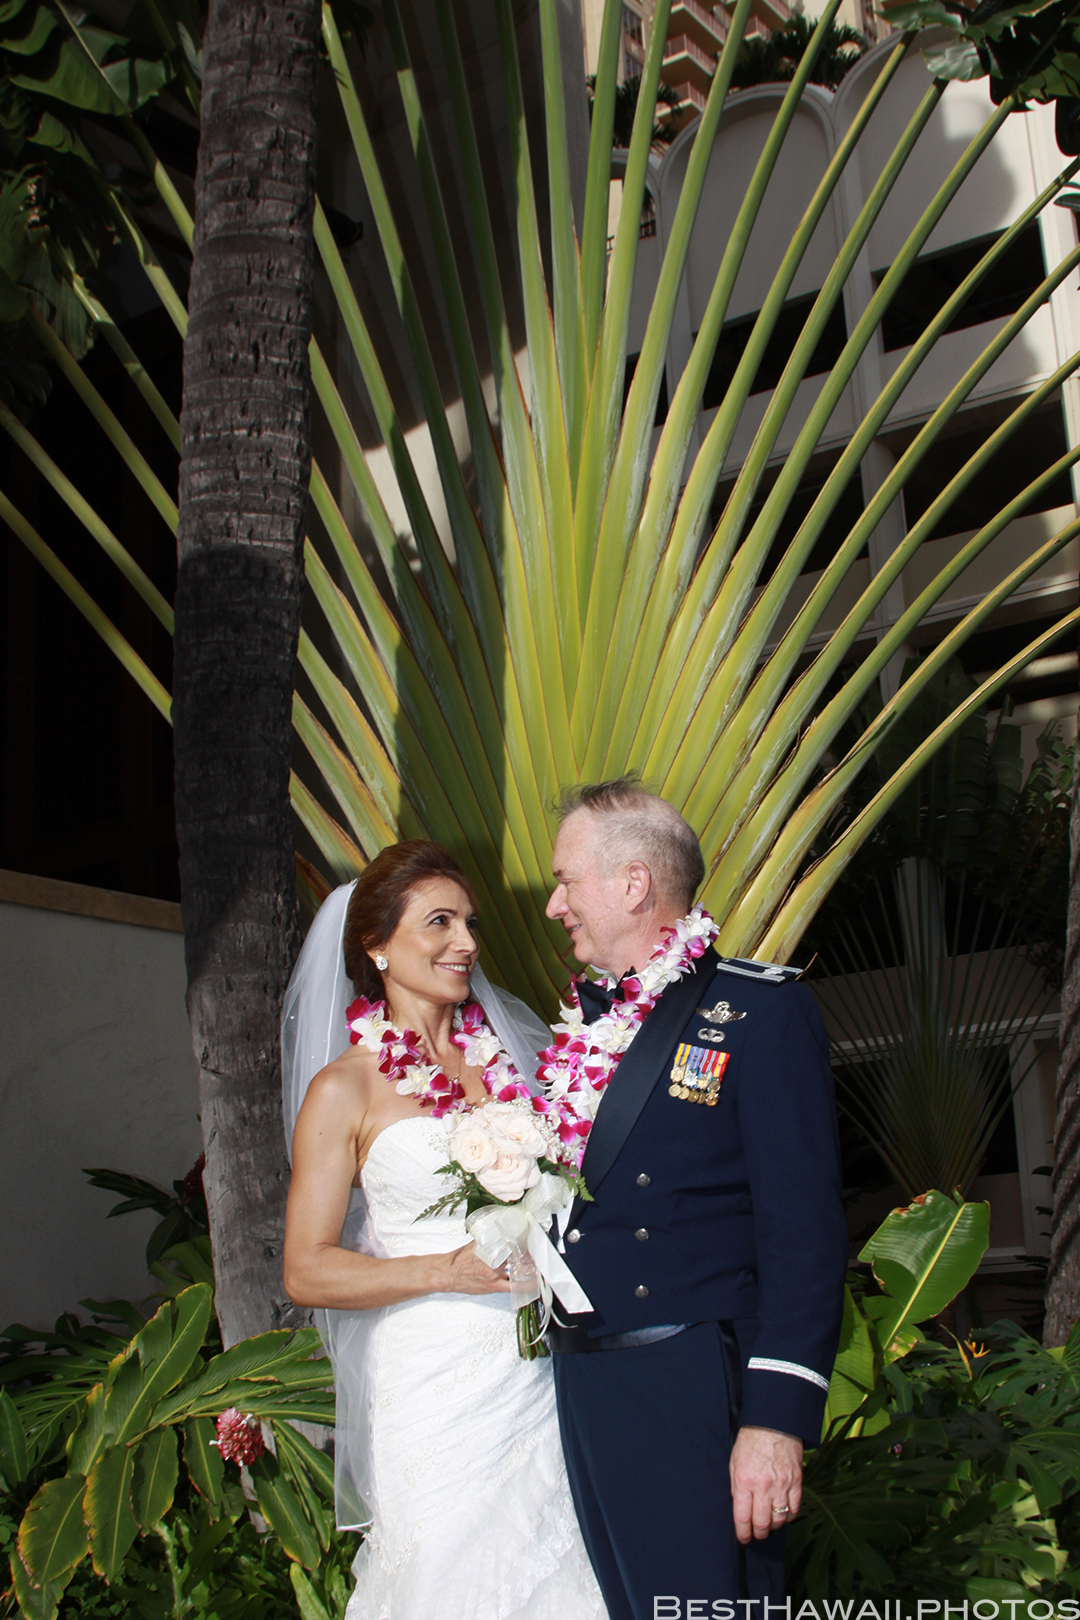 Wedding Photos at Hilton Hawaiian Village by Pasha www.BestHawaii.photos 121820158640